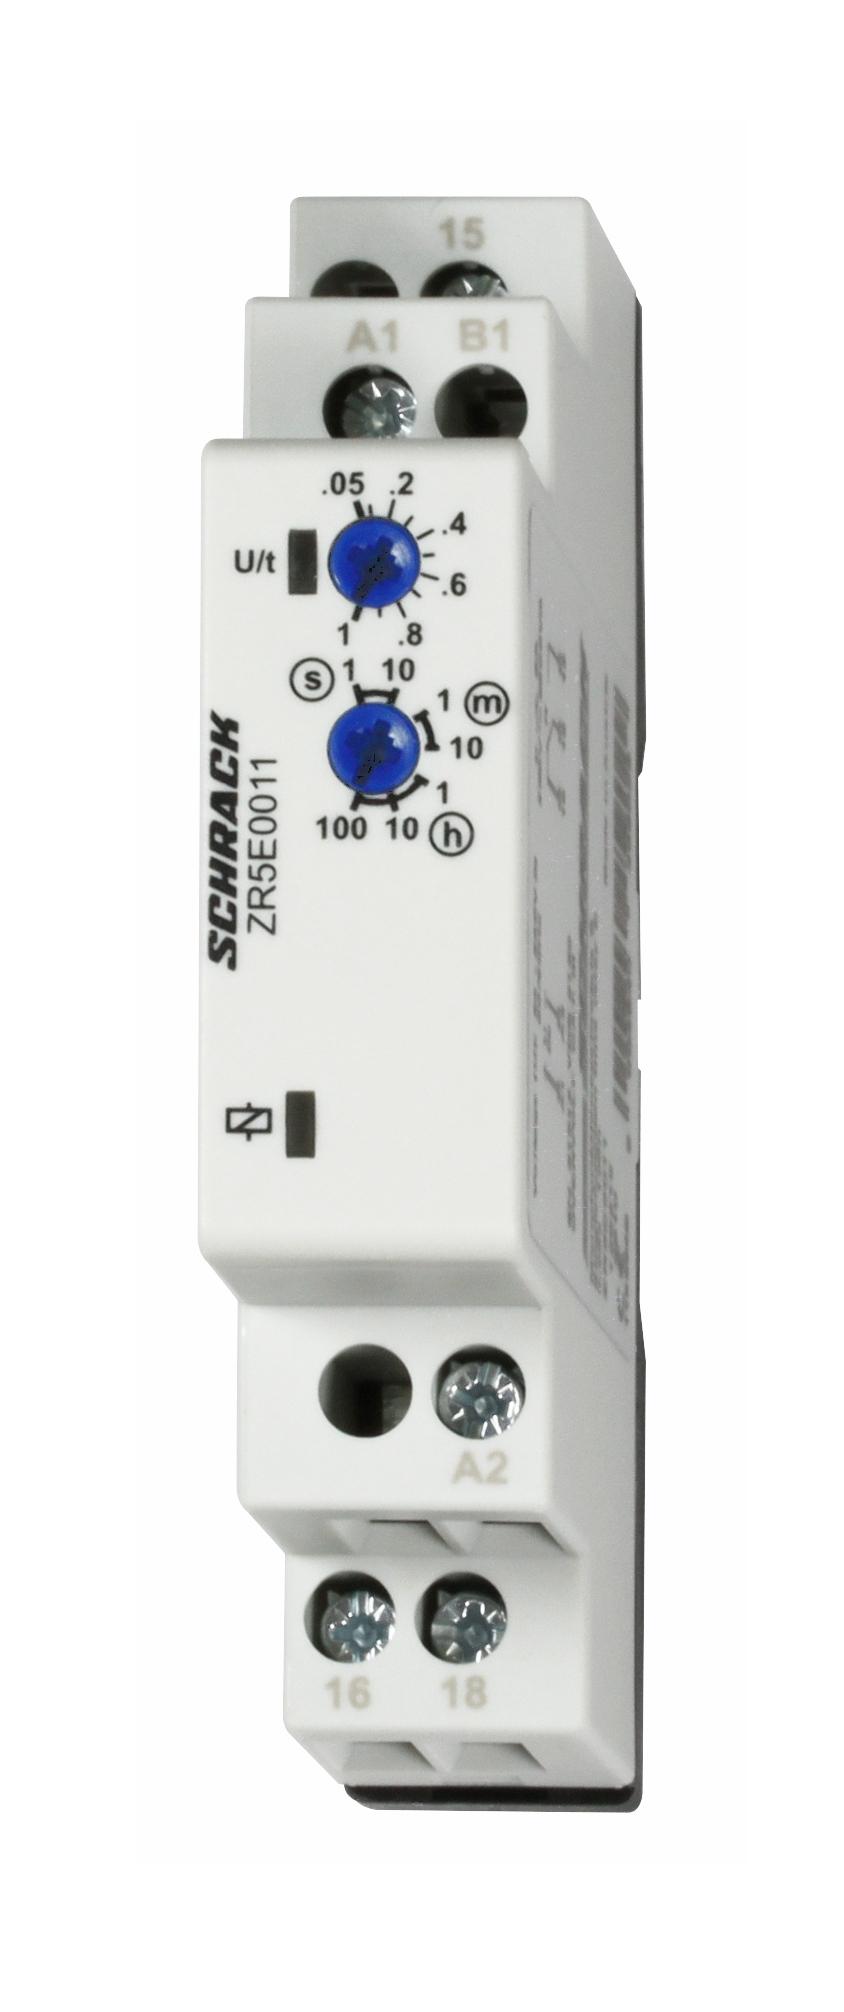 1 Stk Monofunktionsrelais esv., 24-240V AC/DC, 1 Wechsler, 8A/250V ZR5E0011--